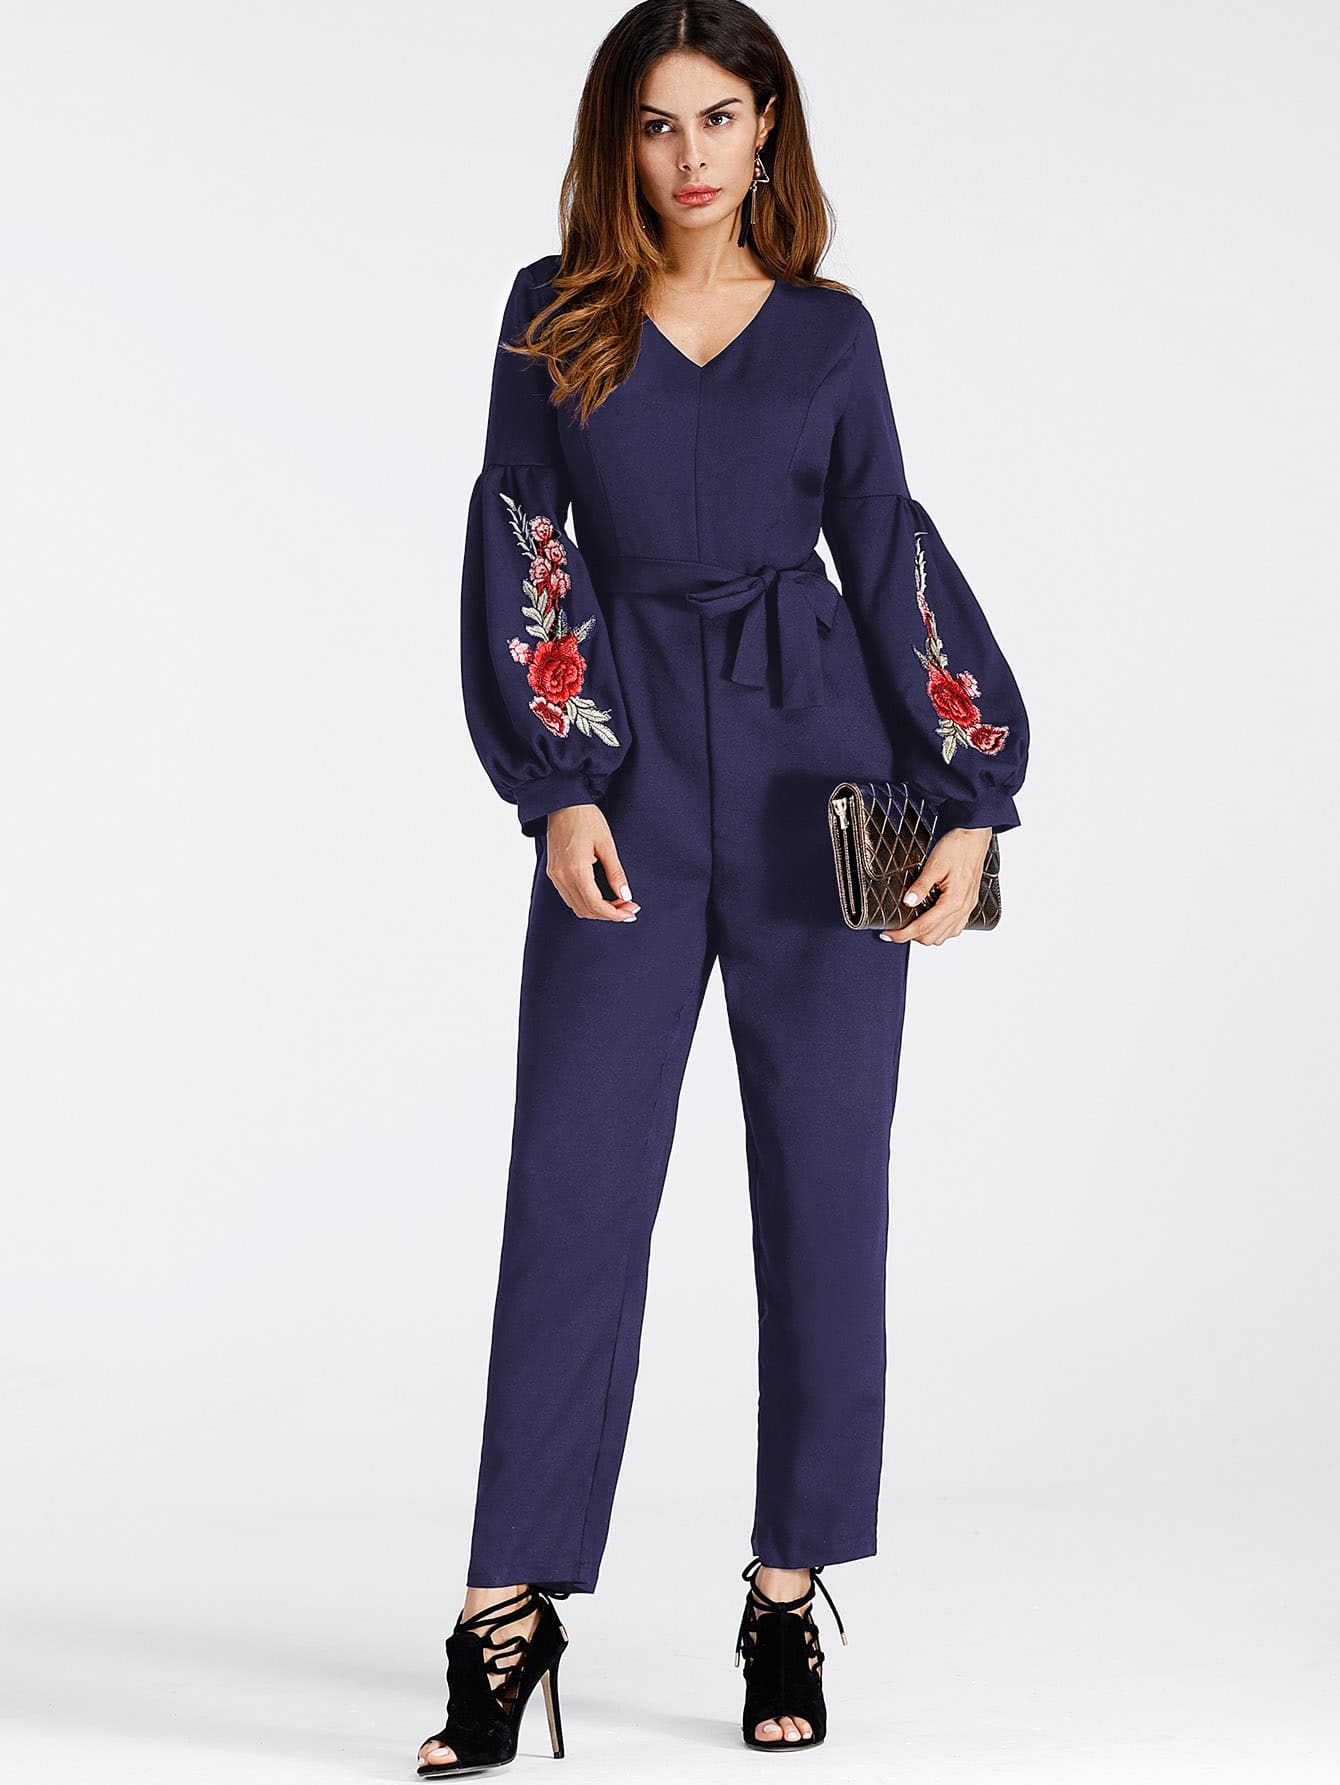 Lantern Sleeve Embroidered Rose Applique Jumpsuit With Belt